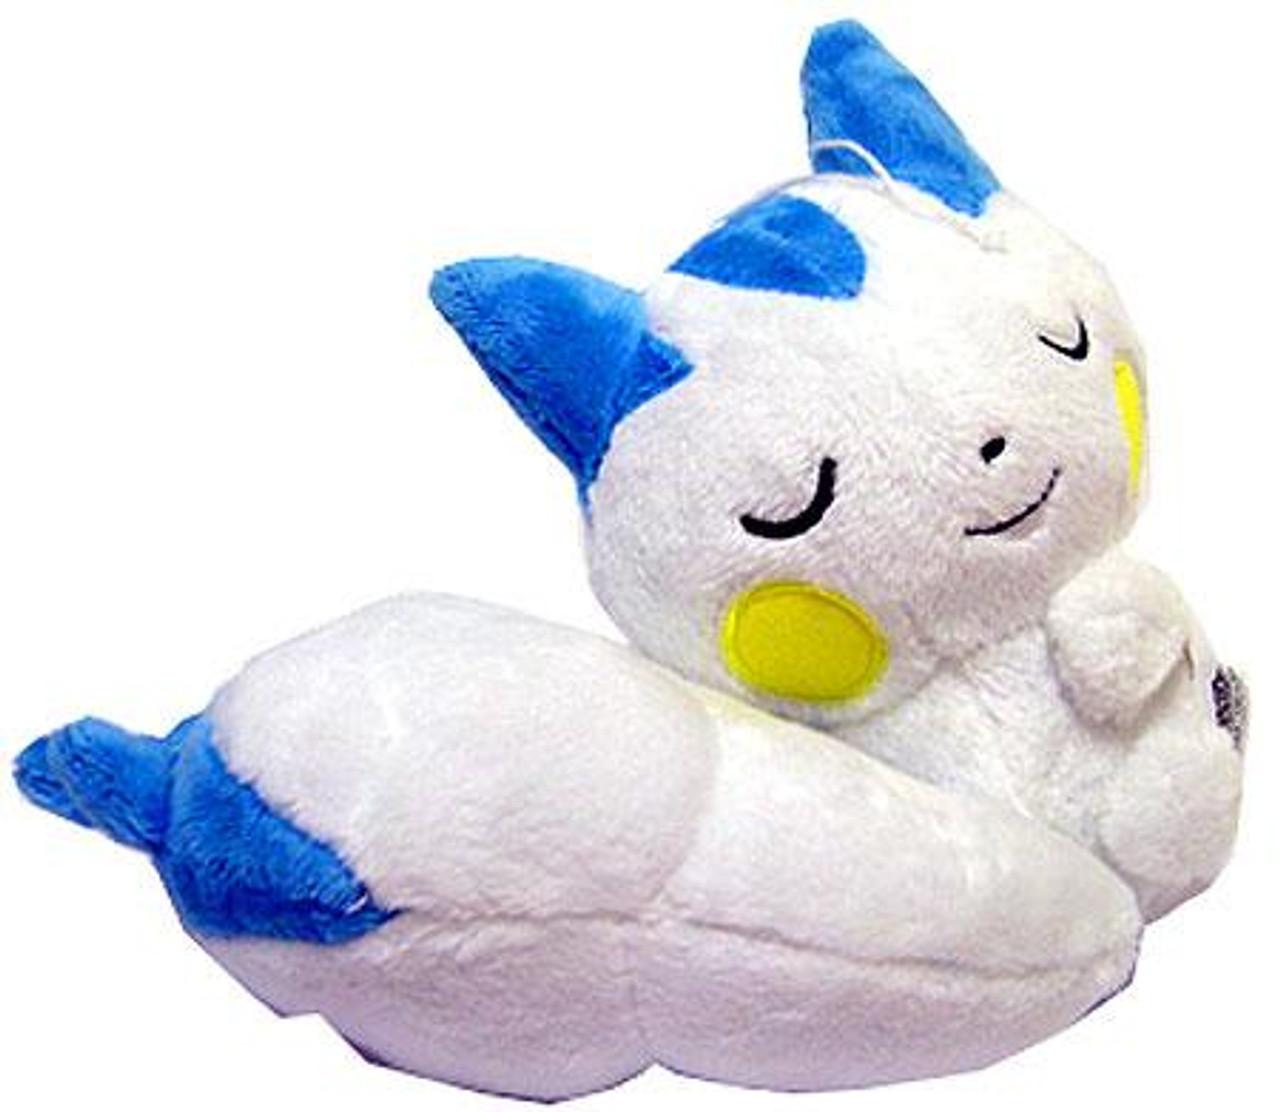 Pokemon Diamond & Pearl 5 Inch Pachirisu Plush [Sleeping, Eyes Closed]